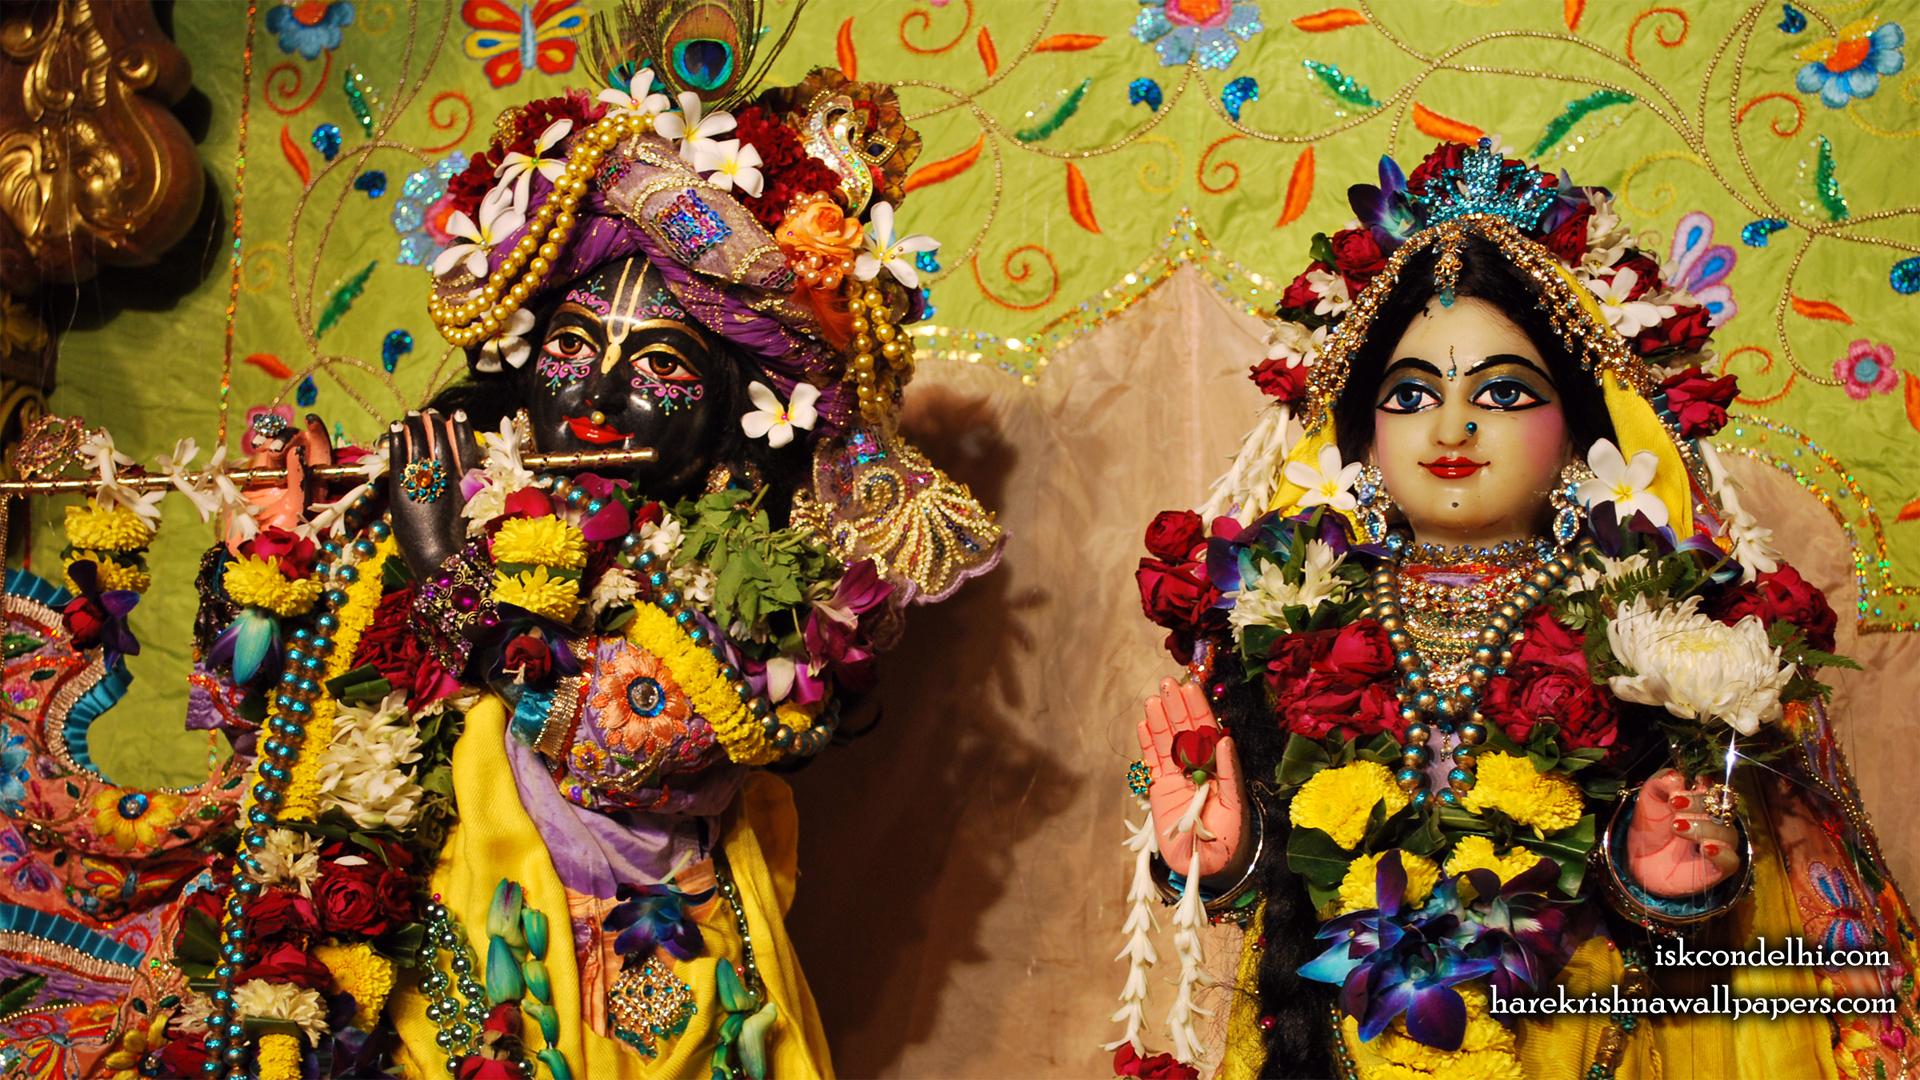 Sri Sri Radha Parthasarathi Close up Wallpaper (015) Size 1920x1080 Download